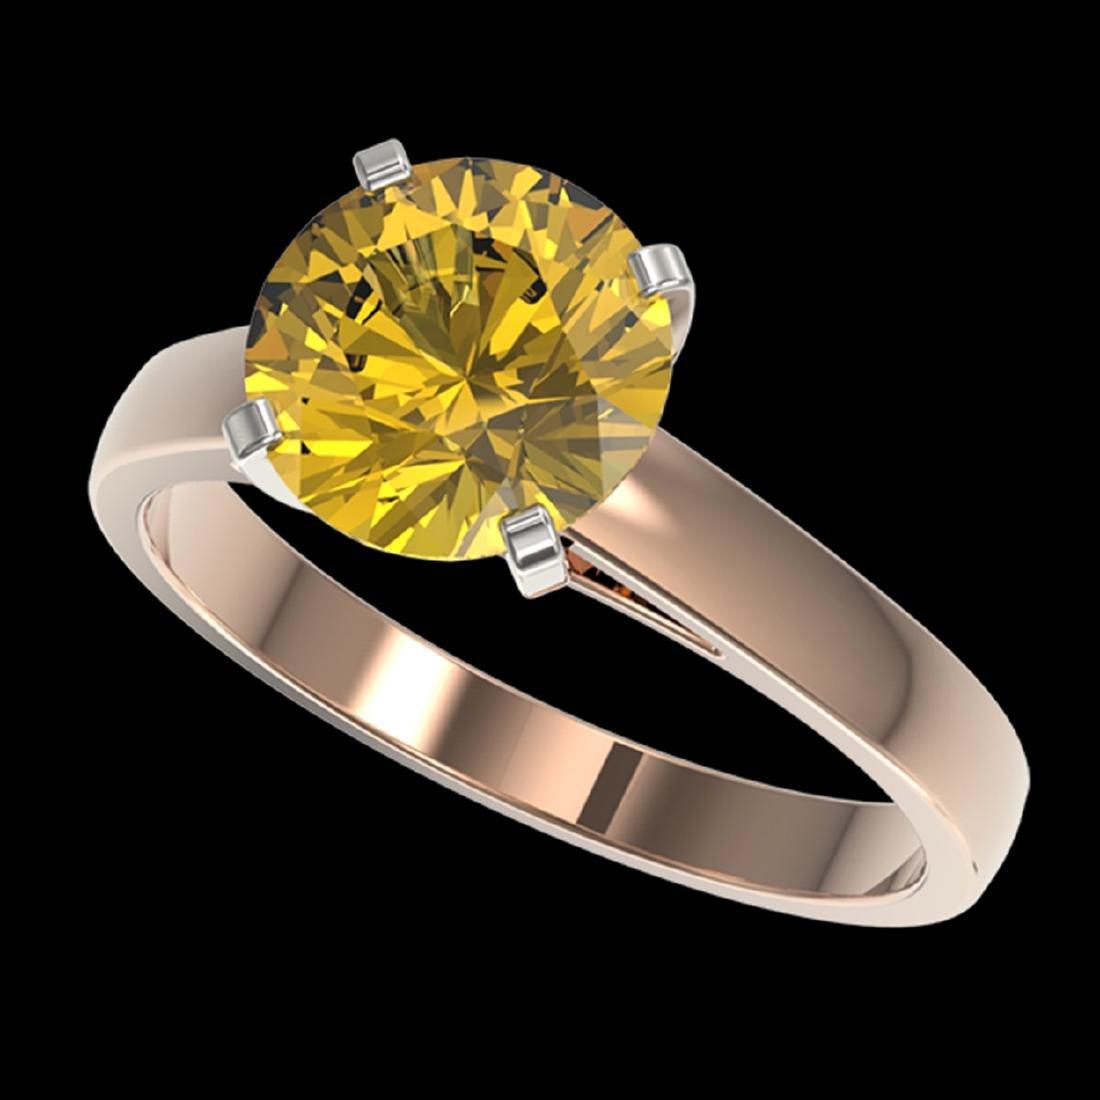 2.50 ctw Intense Yellow Diamond Solitaire Ring 10K Rose